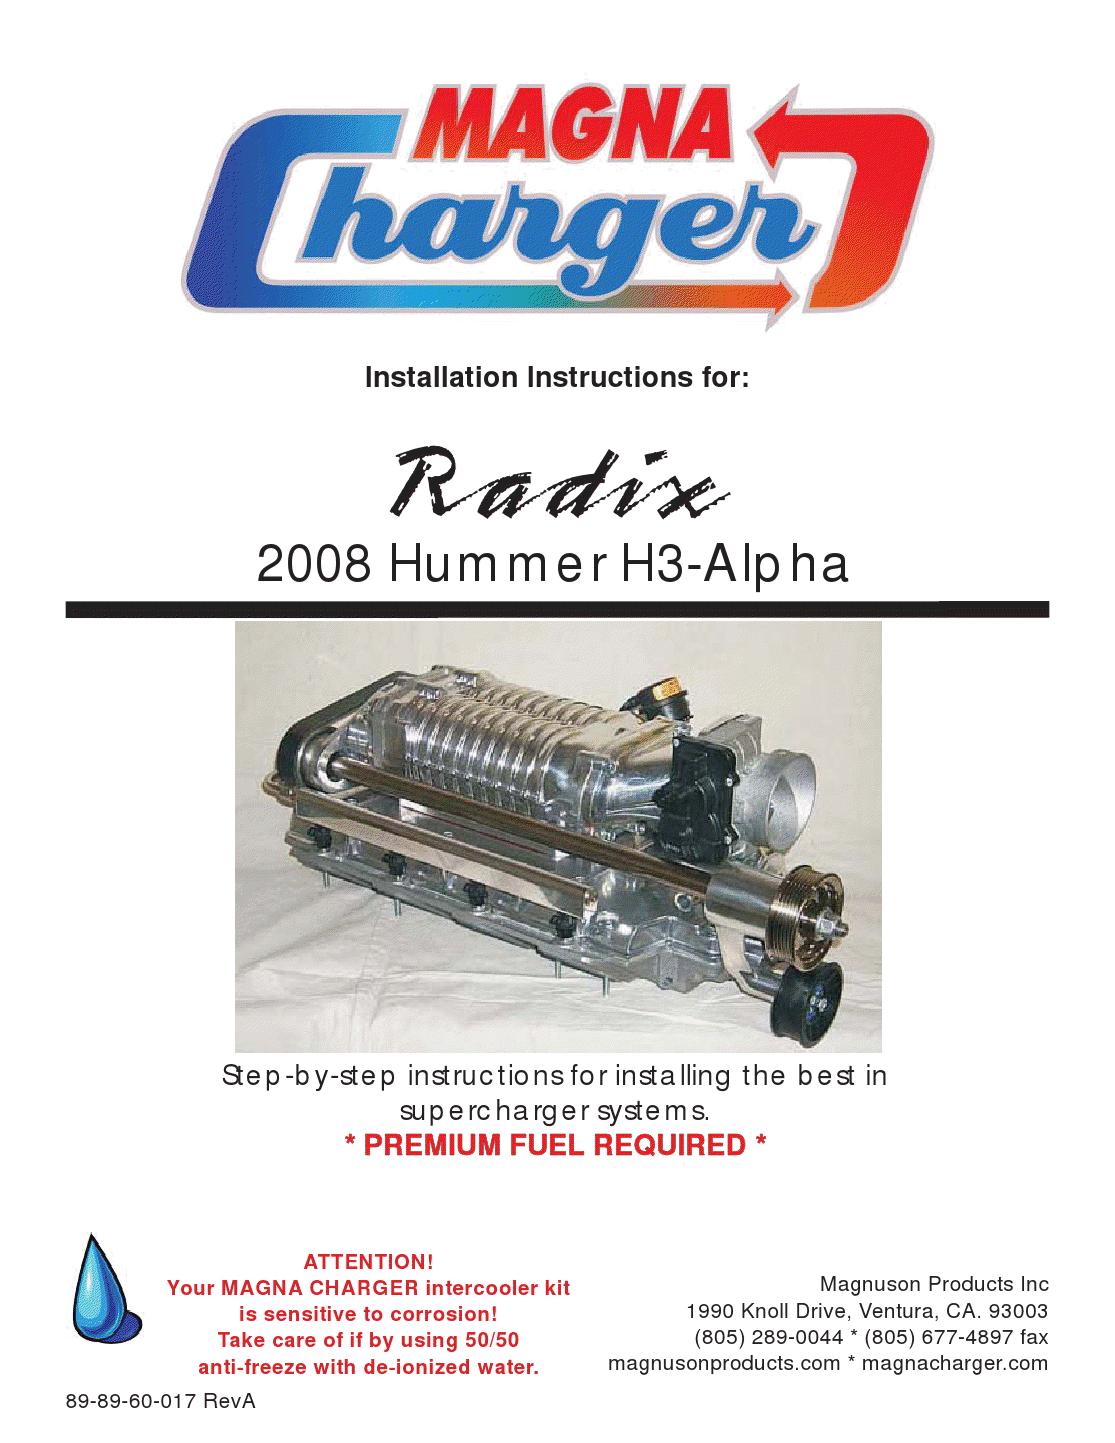 hummermanuals: Installation Instructions for: 2008 Hummer H3-Alpha